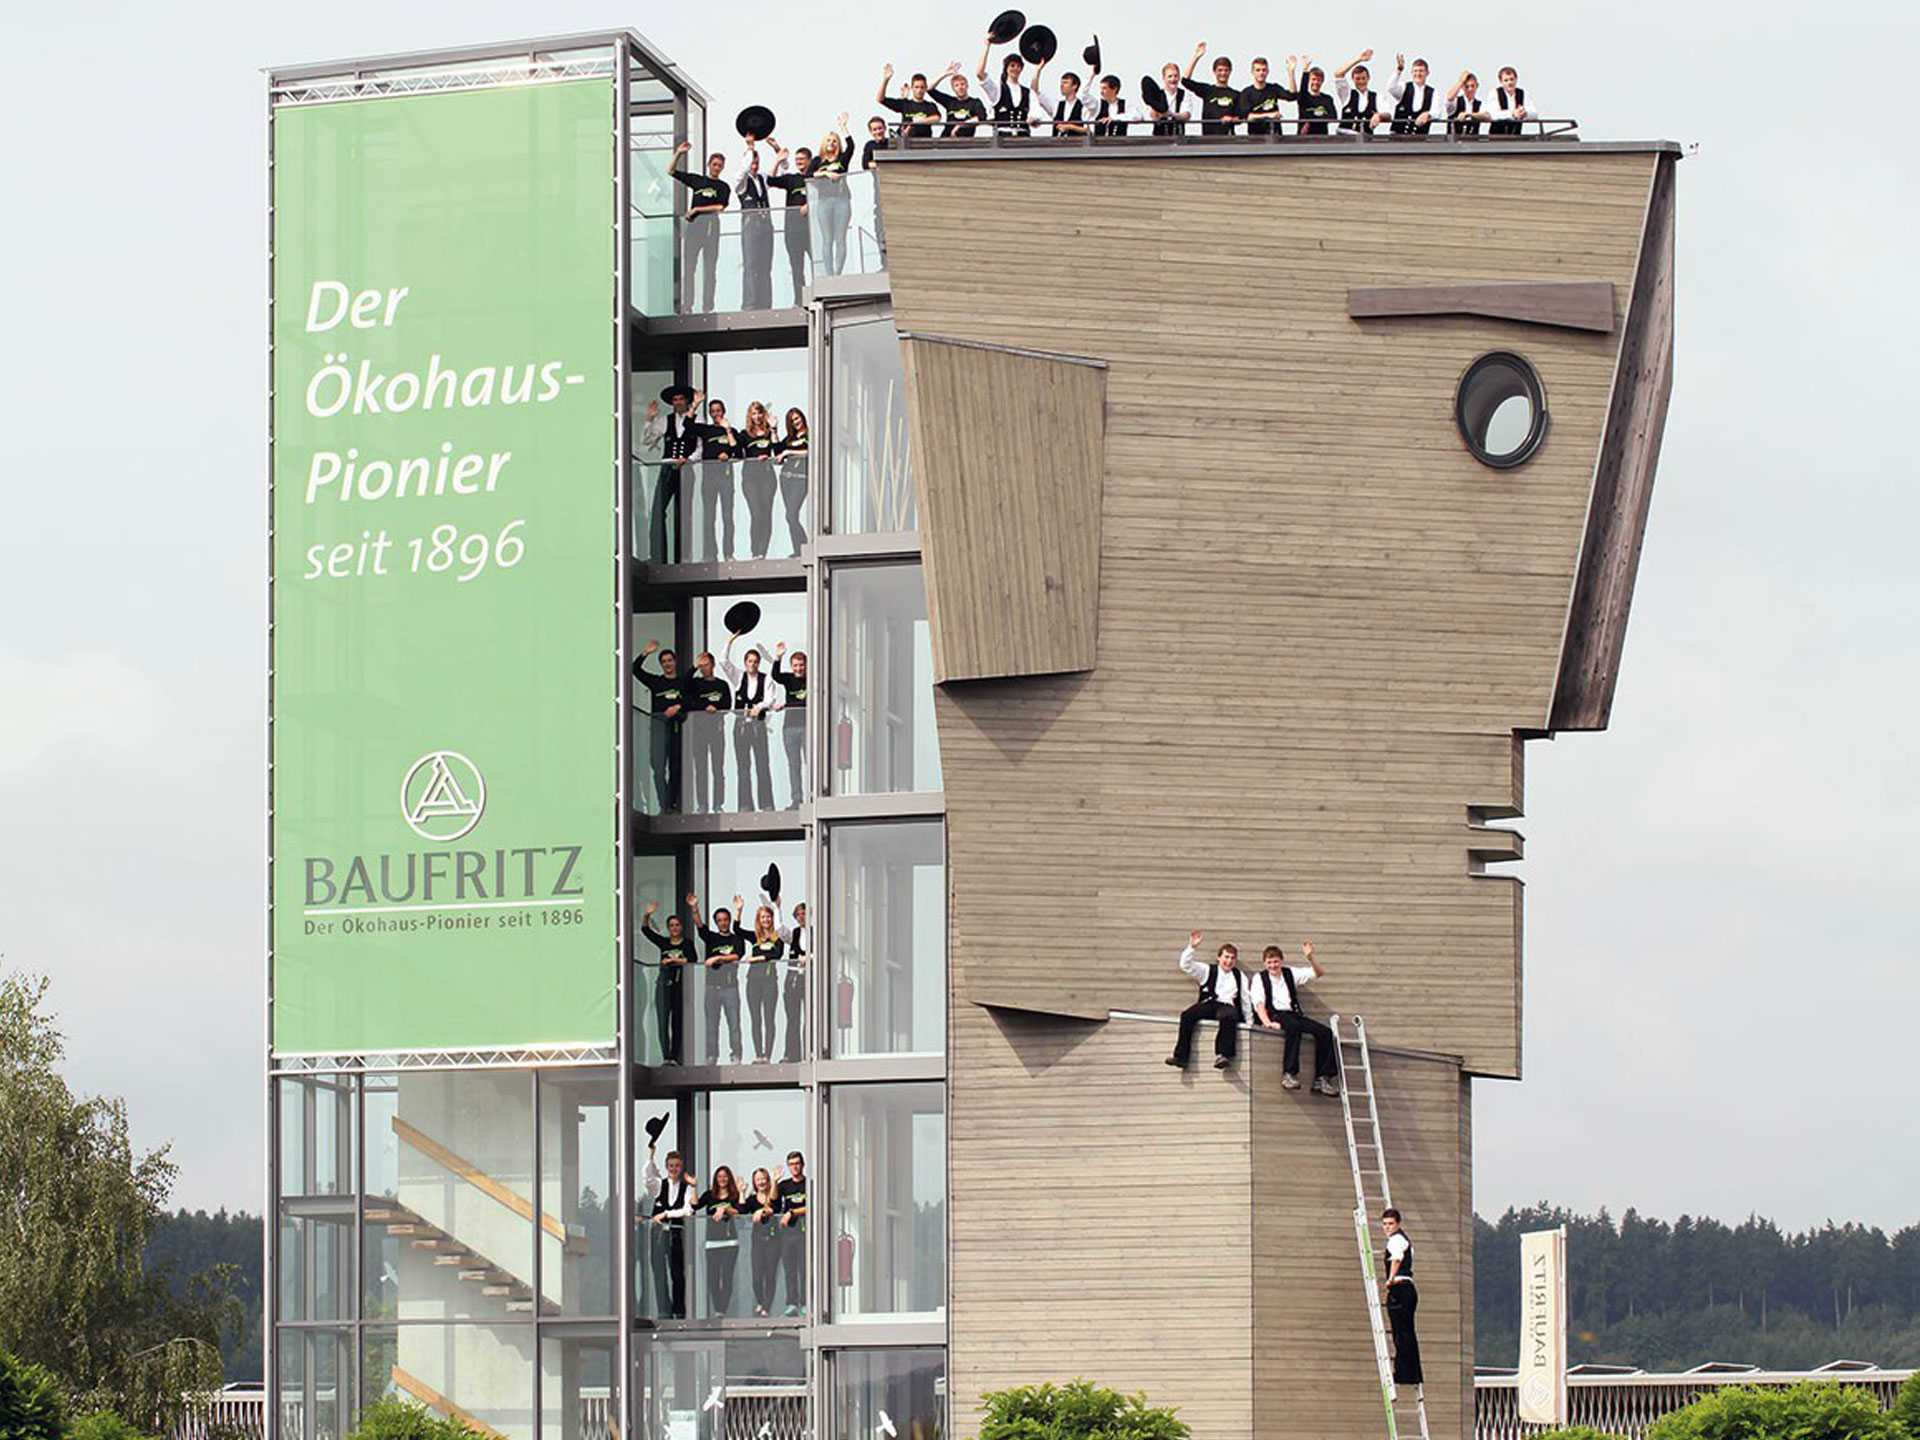 Baufritz Holzkopf